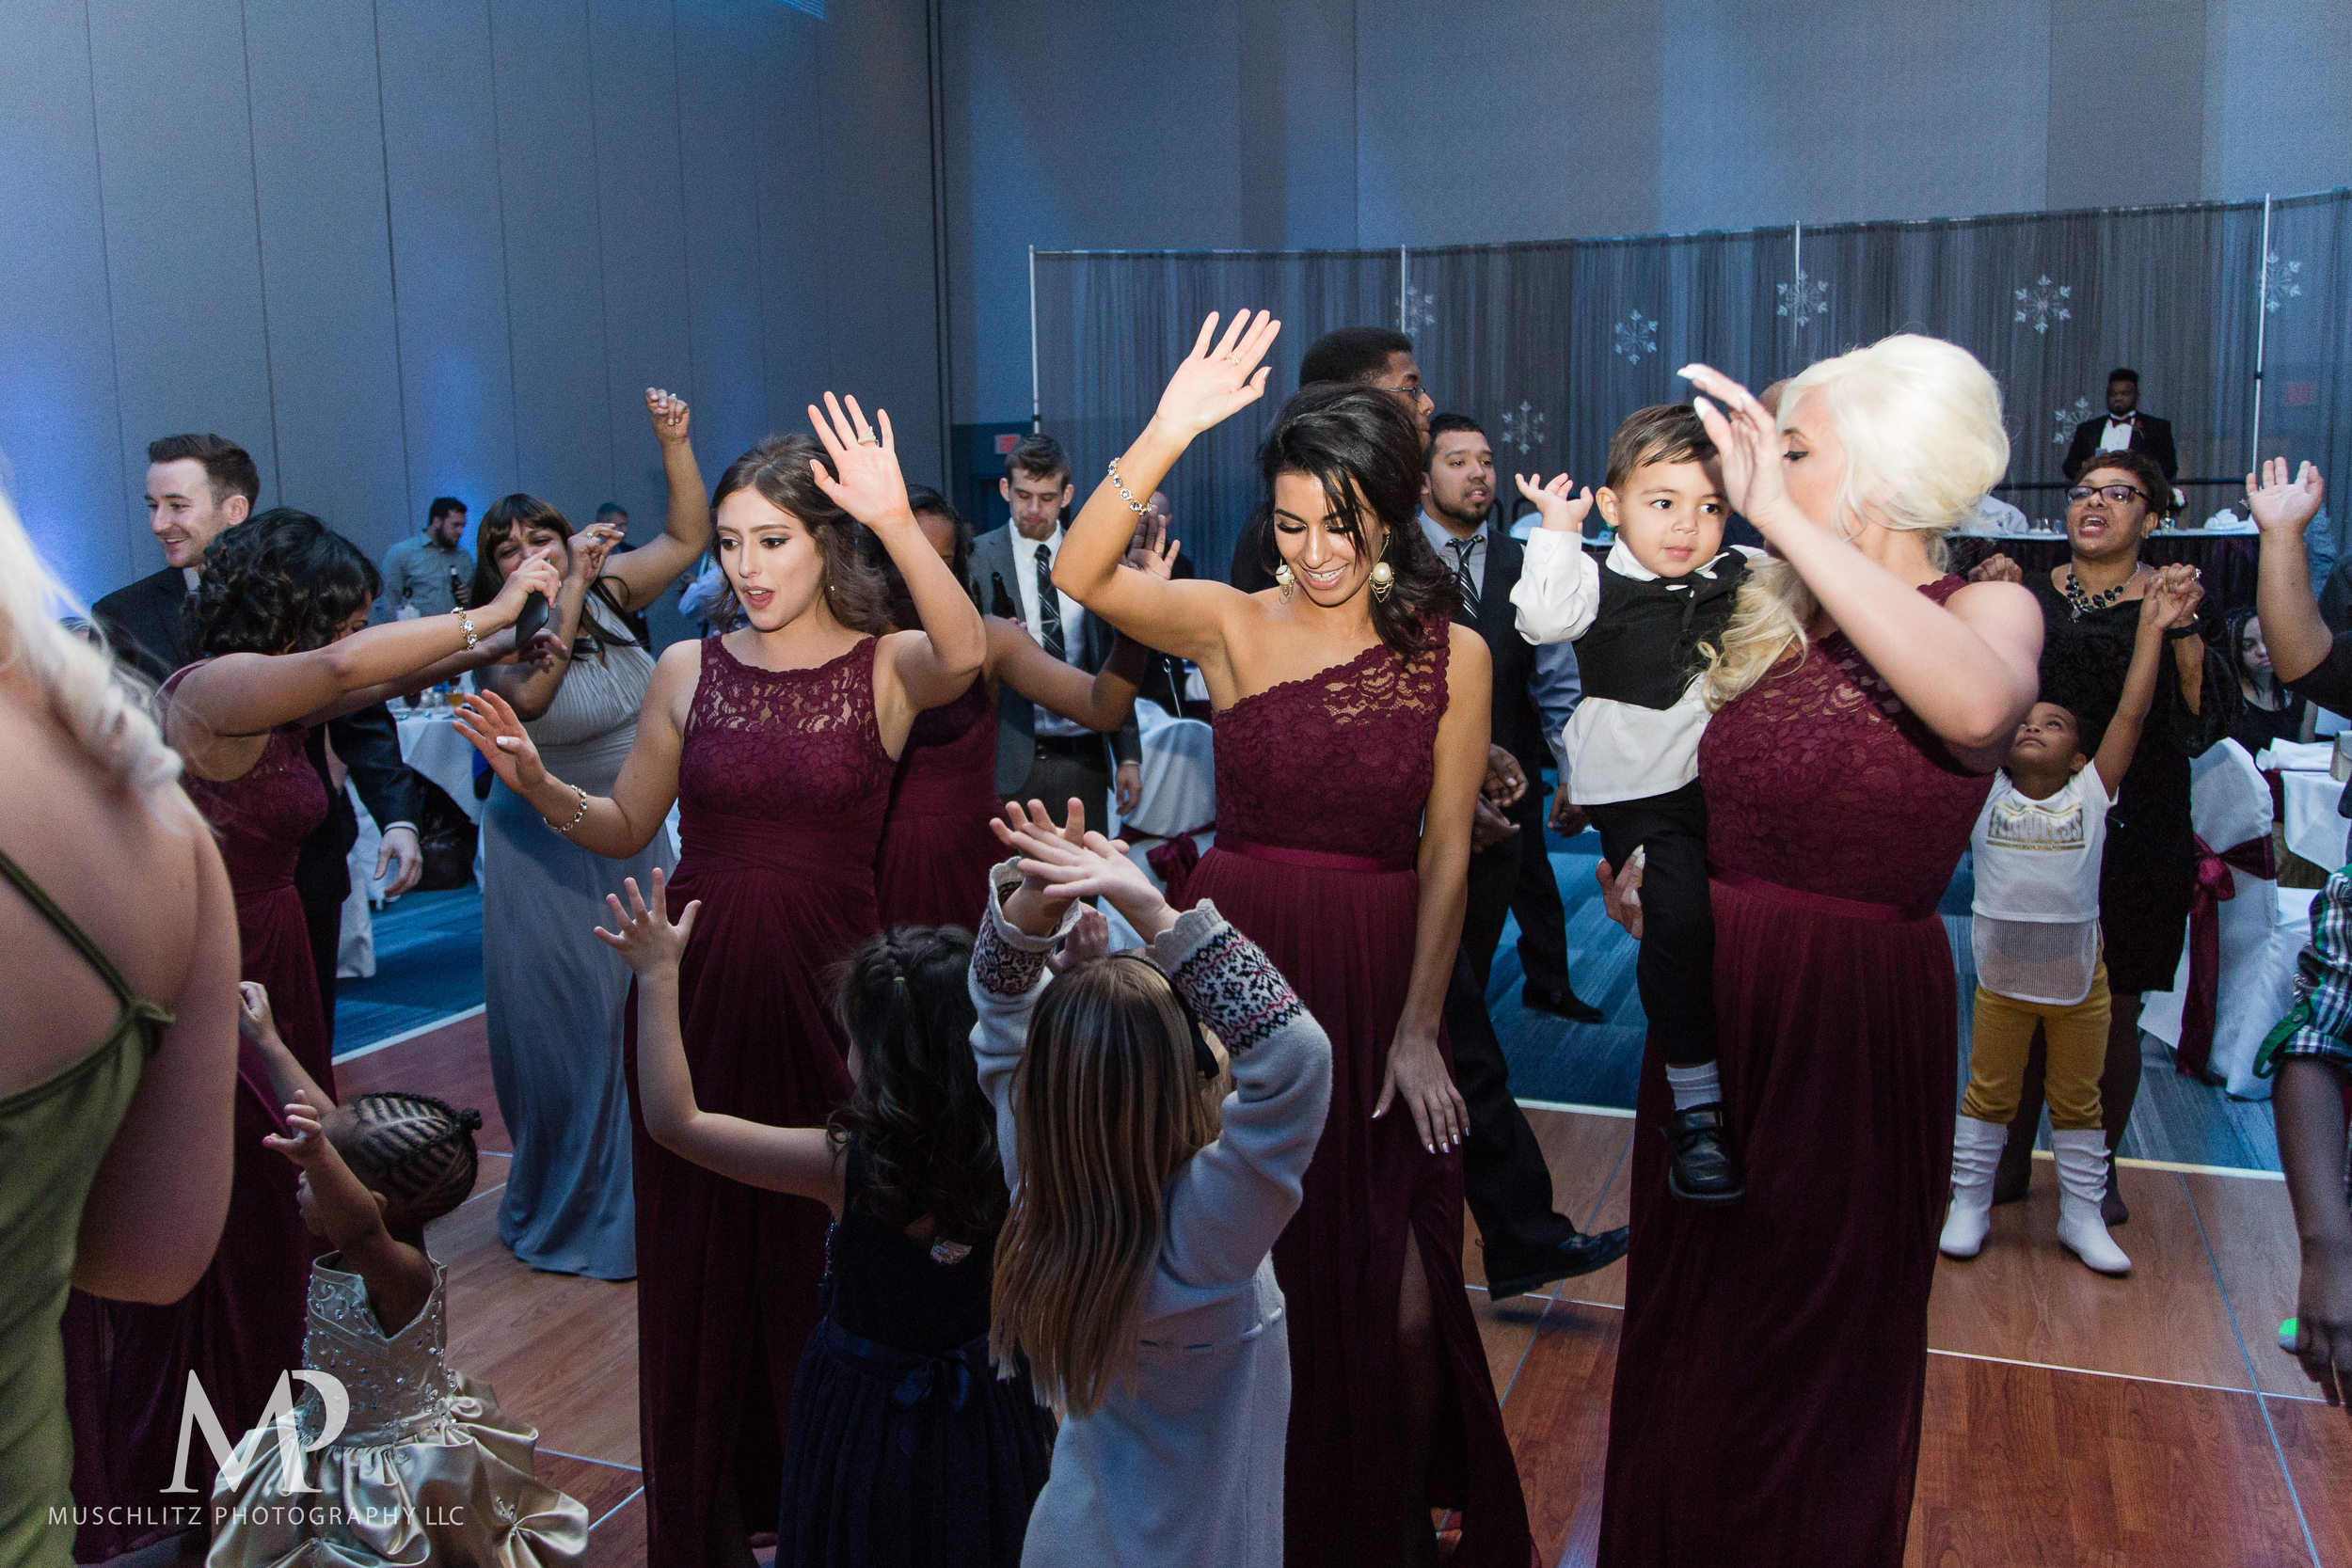 greater-columbus-convention-center-winter-wedding-ceremony-reception-portraits-columbus-ohio-muschlitz-photography-085.JPG